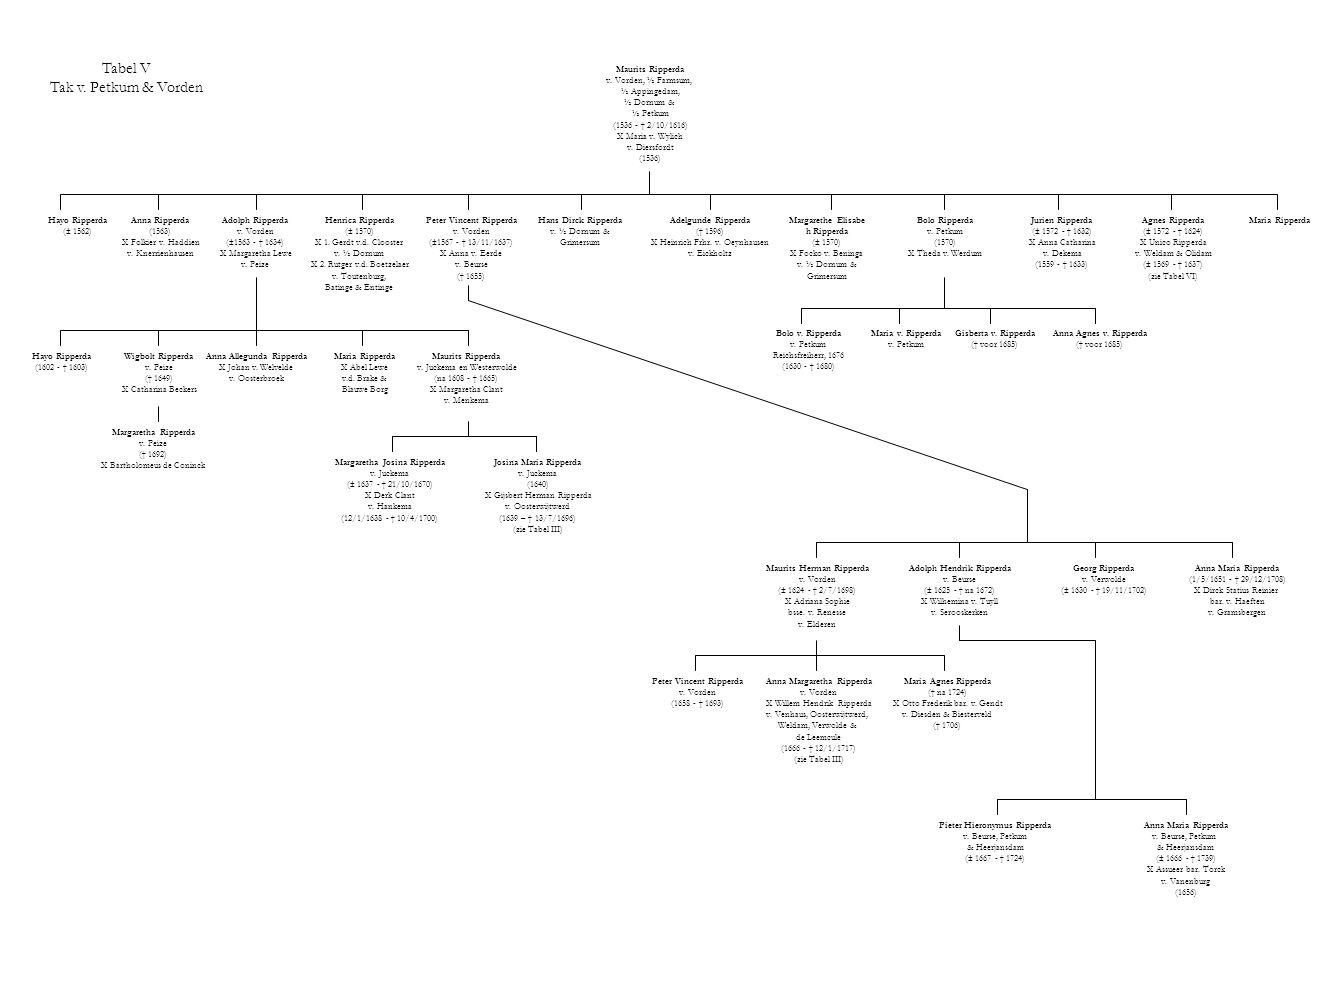 Tabel V Tak v. Petkum & Vorden Maurits Ripperda v. Vorden, ½ Farmsum,